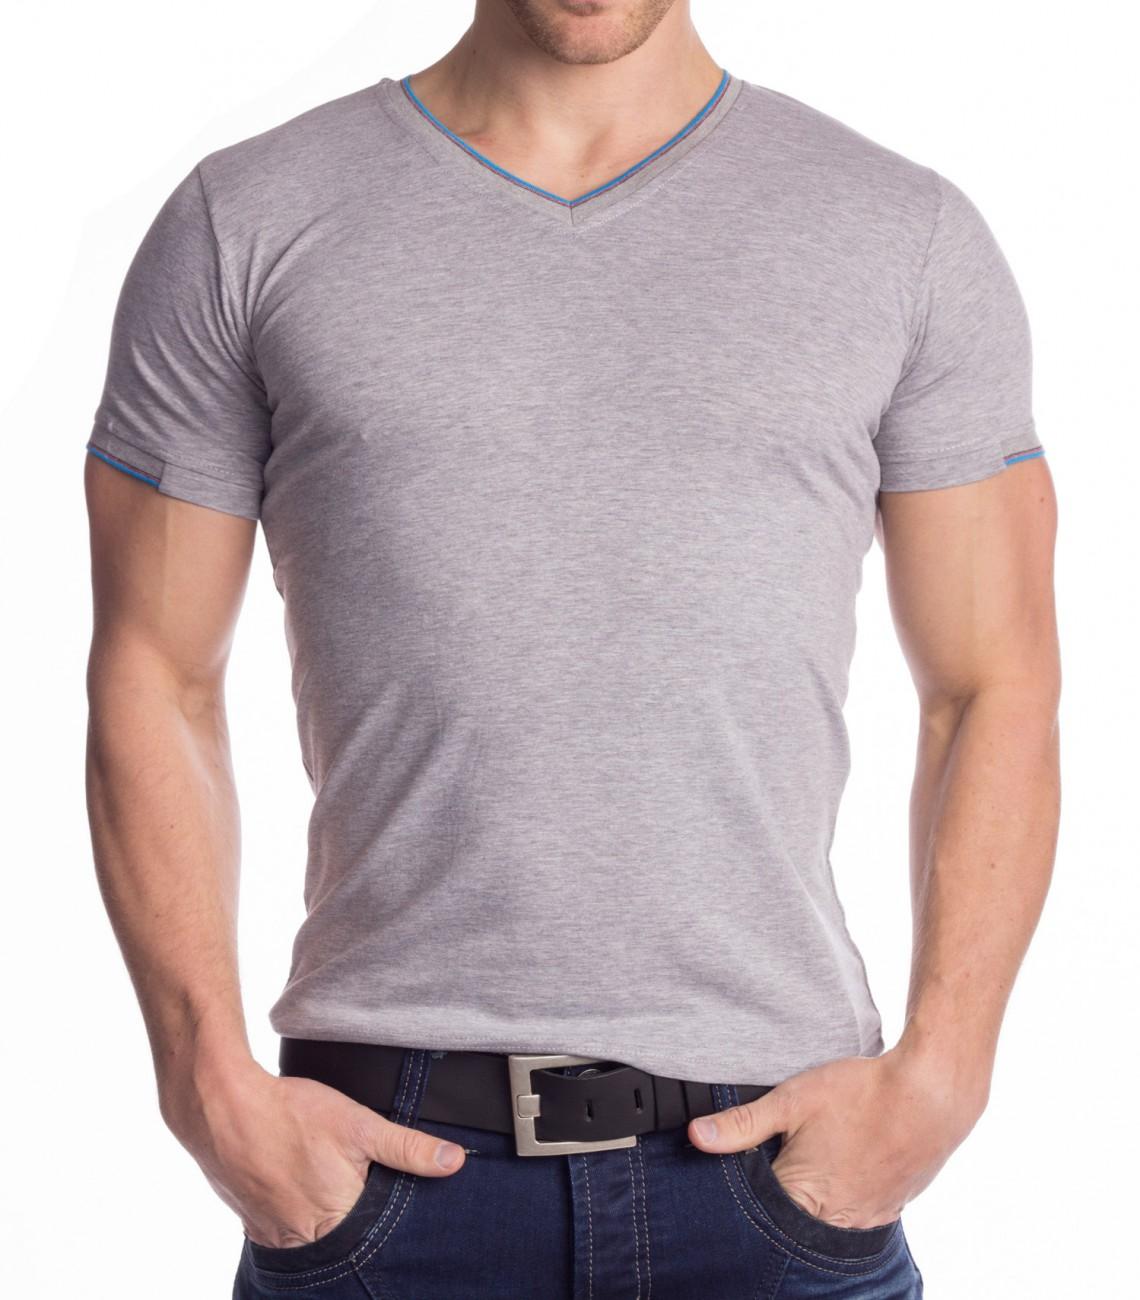 d49cd9e5cb086 Hombre Camiseta cuello de pico camisas camisetas elasticas jersey ...